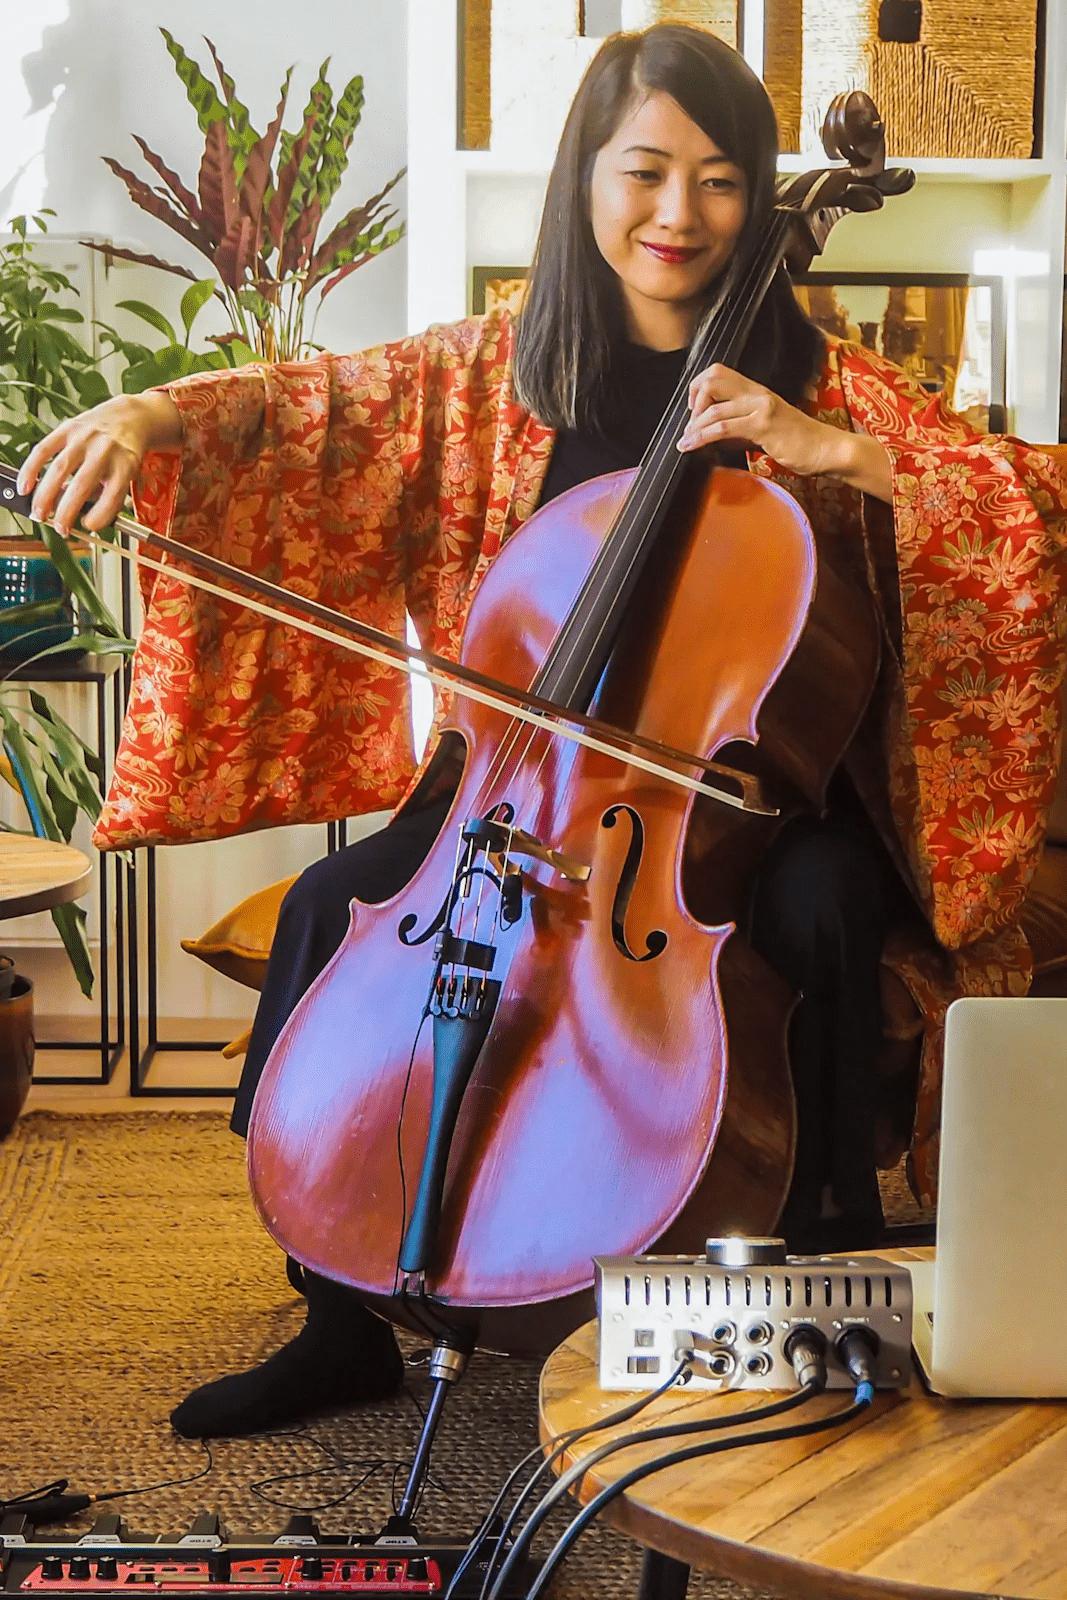 cello meditation concert netherlands online cultural activity